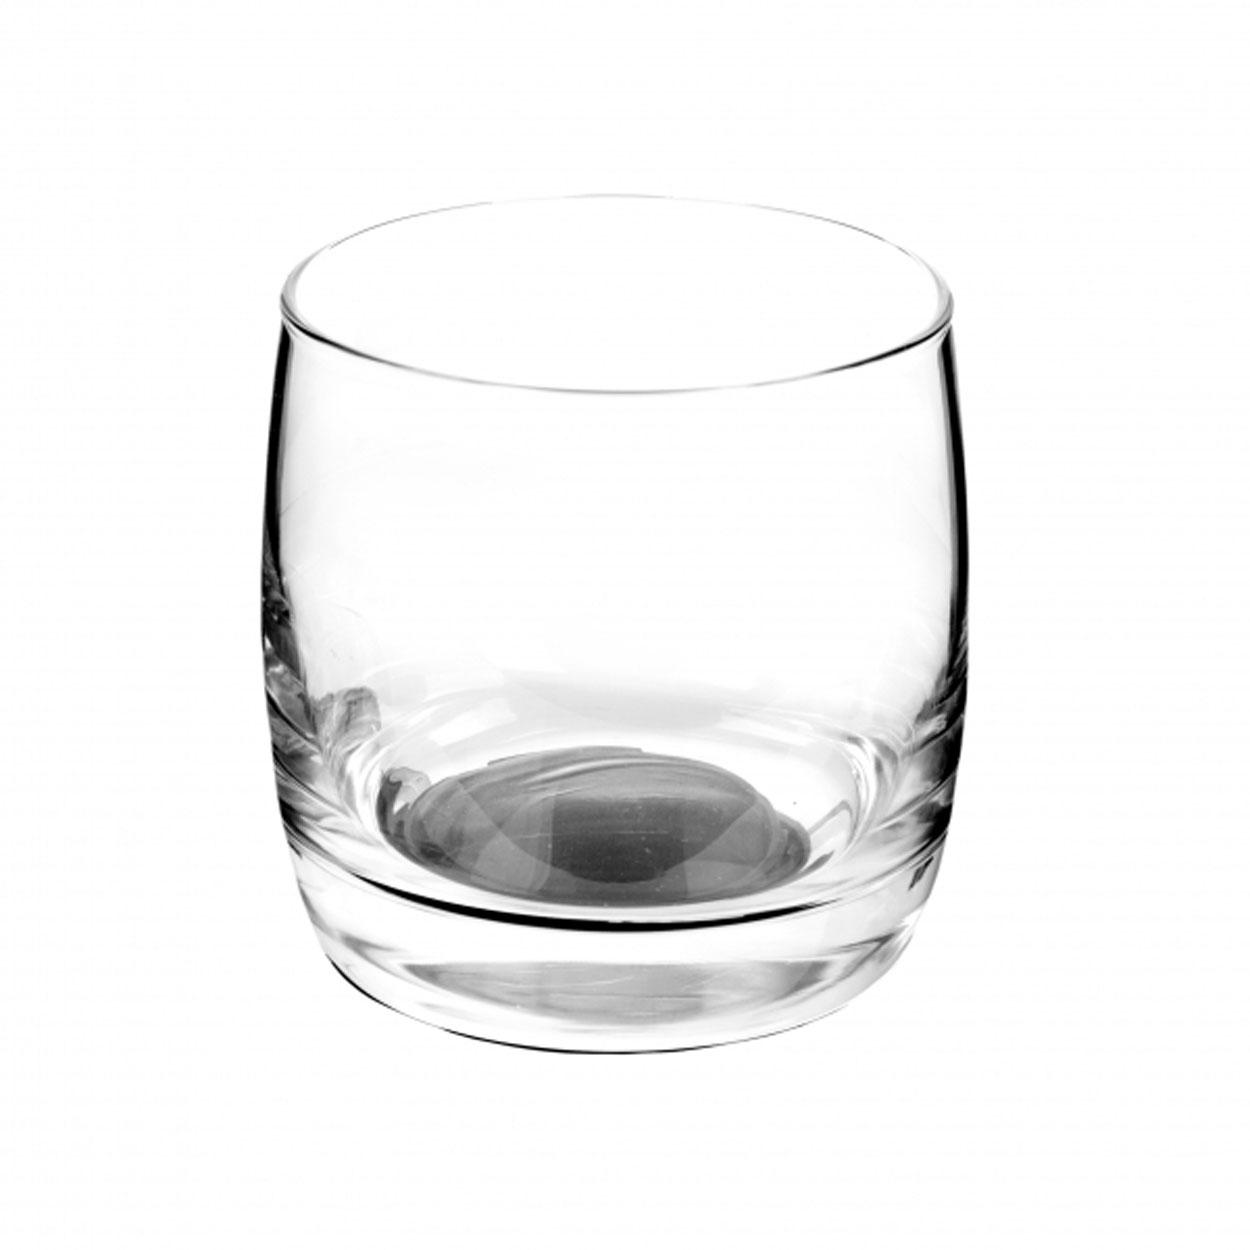 Набор стаканов Luminarc Luminarc French Brasserie, 310 мл, 6 шт набор стаканов luminarc french brasserie 6шт 310мл низк